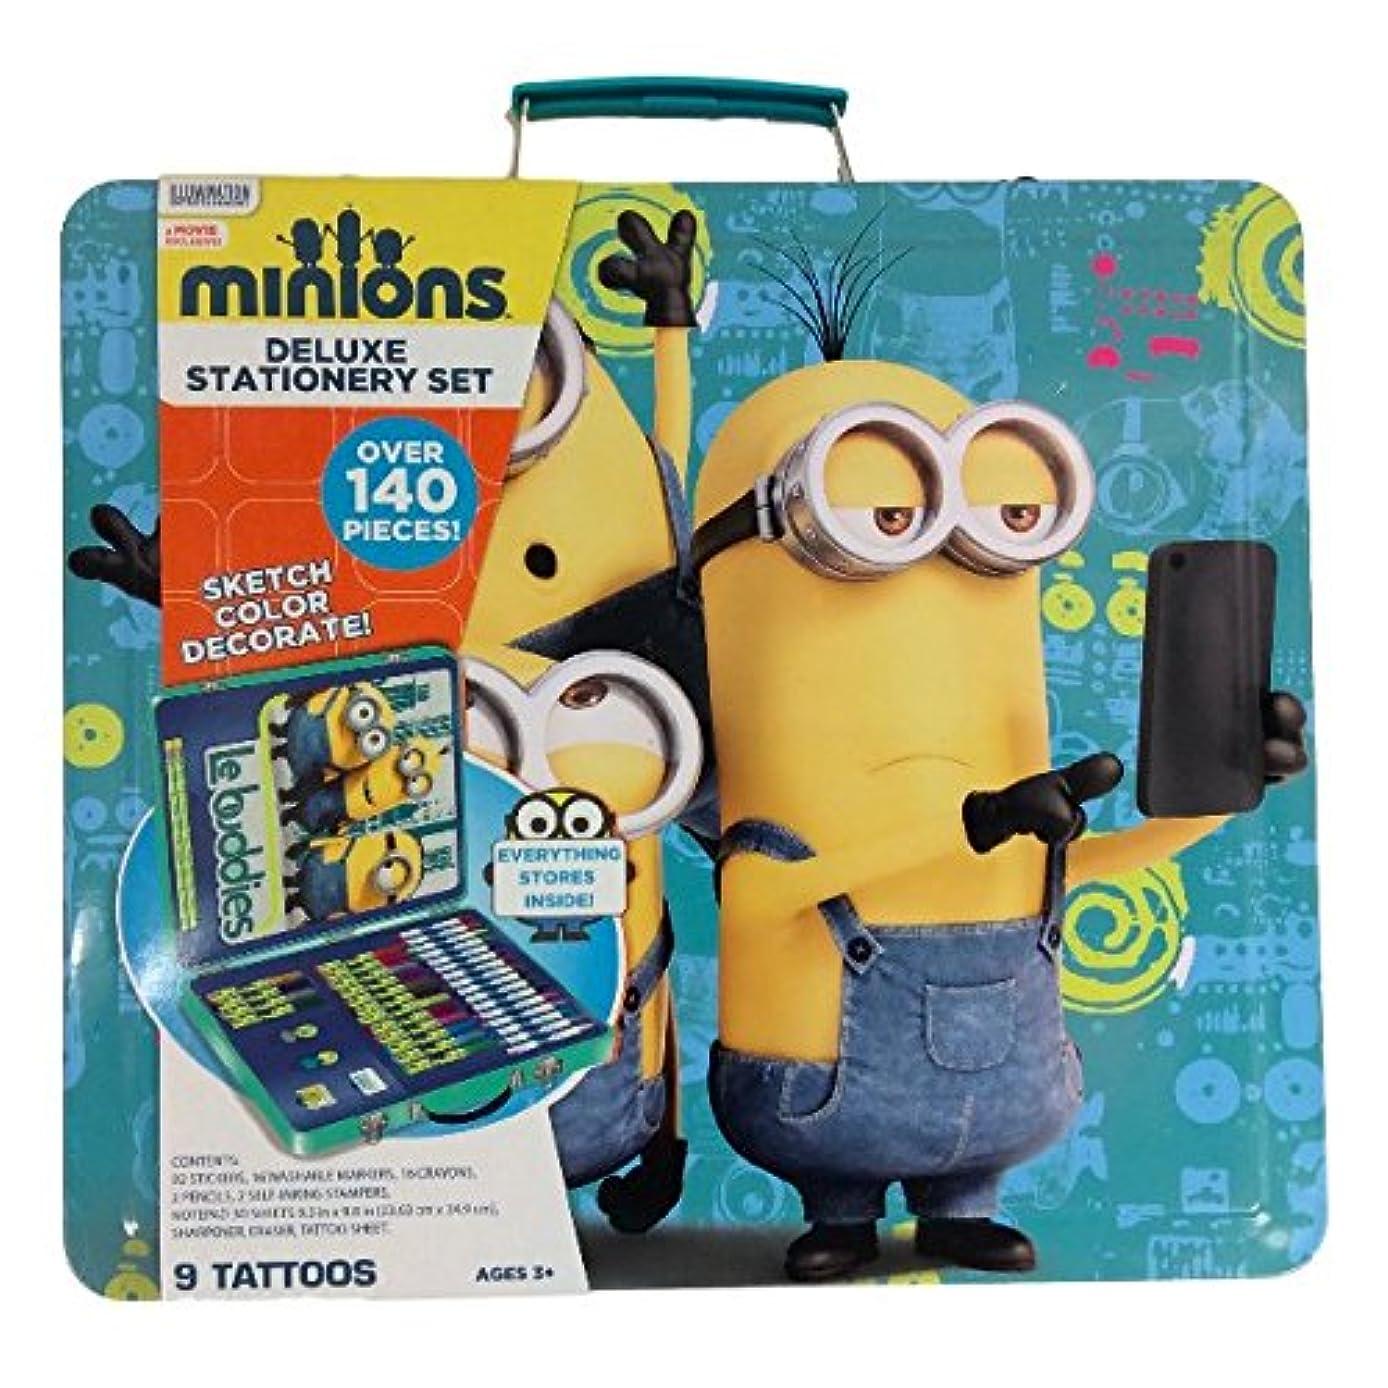 Illumination Entertainment Minions Stationary Set Over 140 Pcs